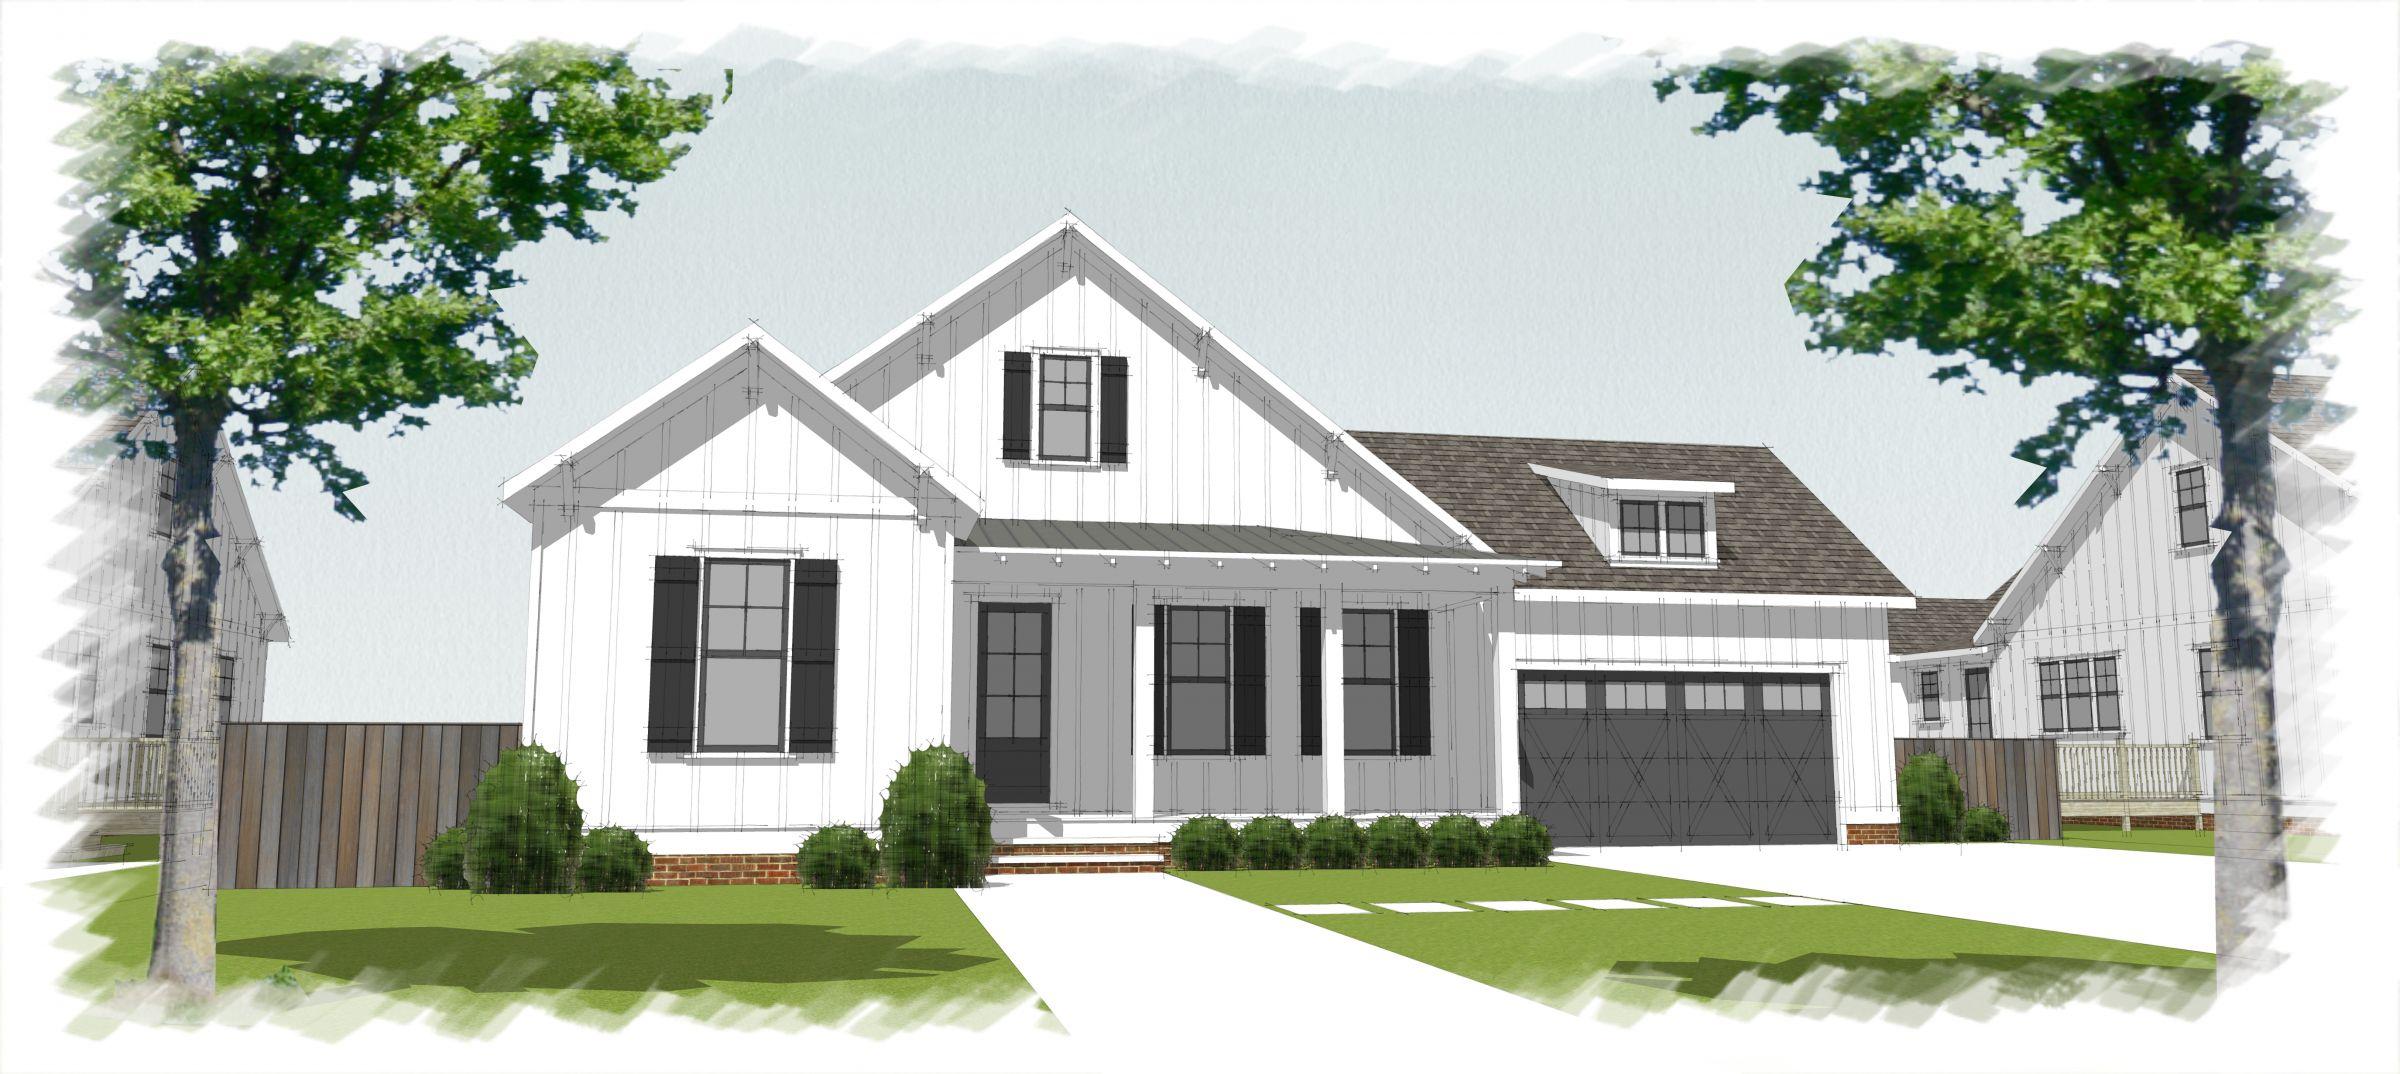 residential-warren-county-iowa-0-acres-listing-number-15610-1-2021-06-23-182813.jpg